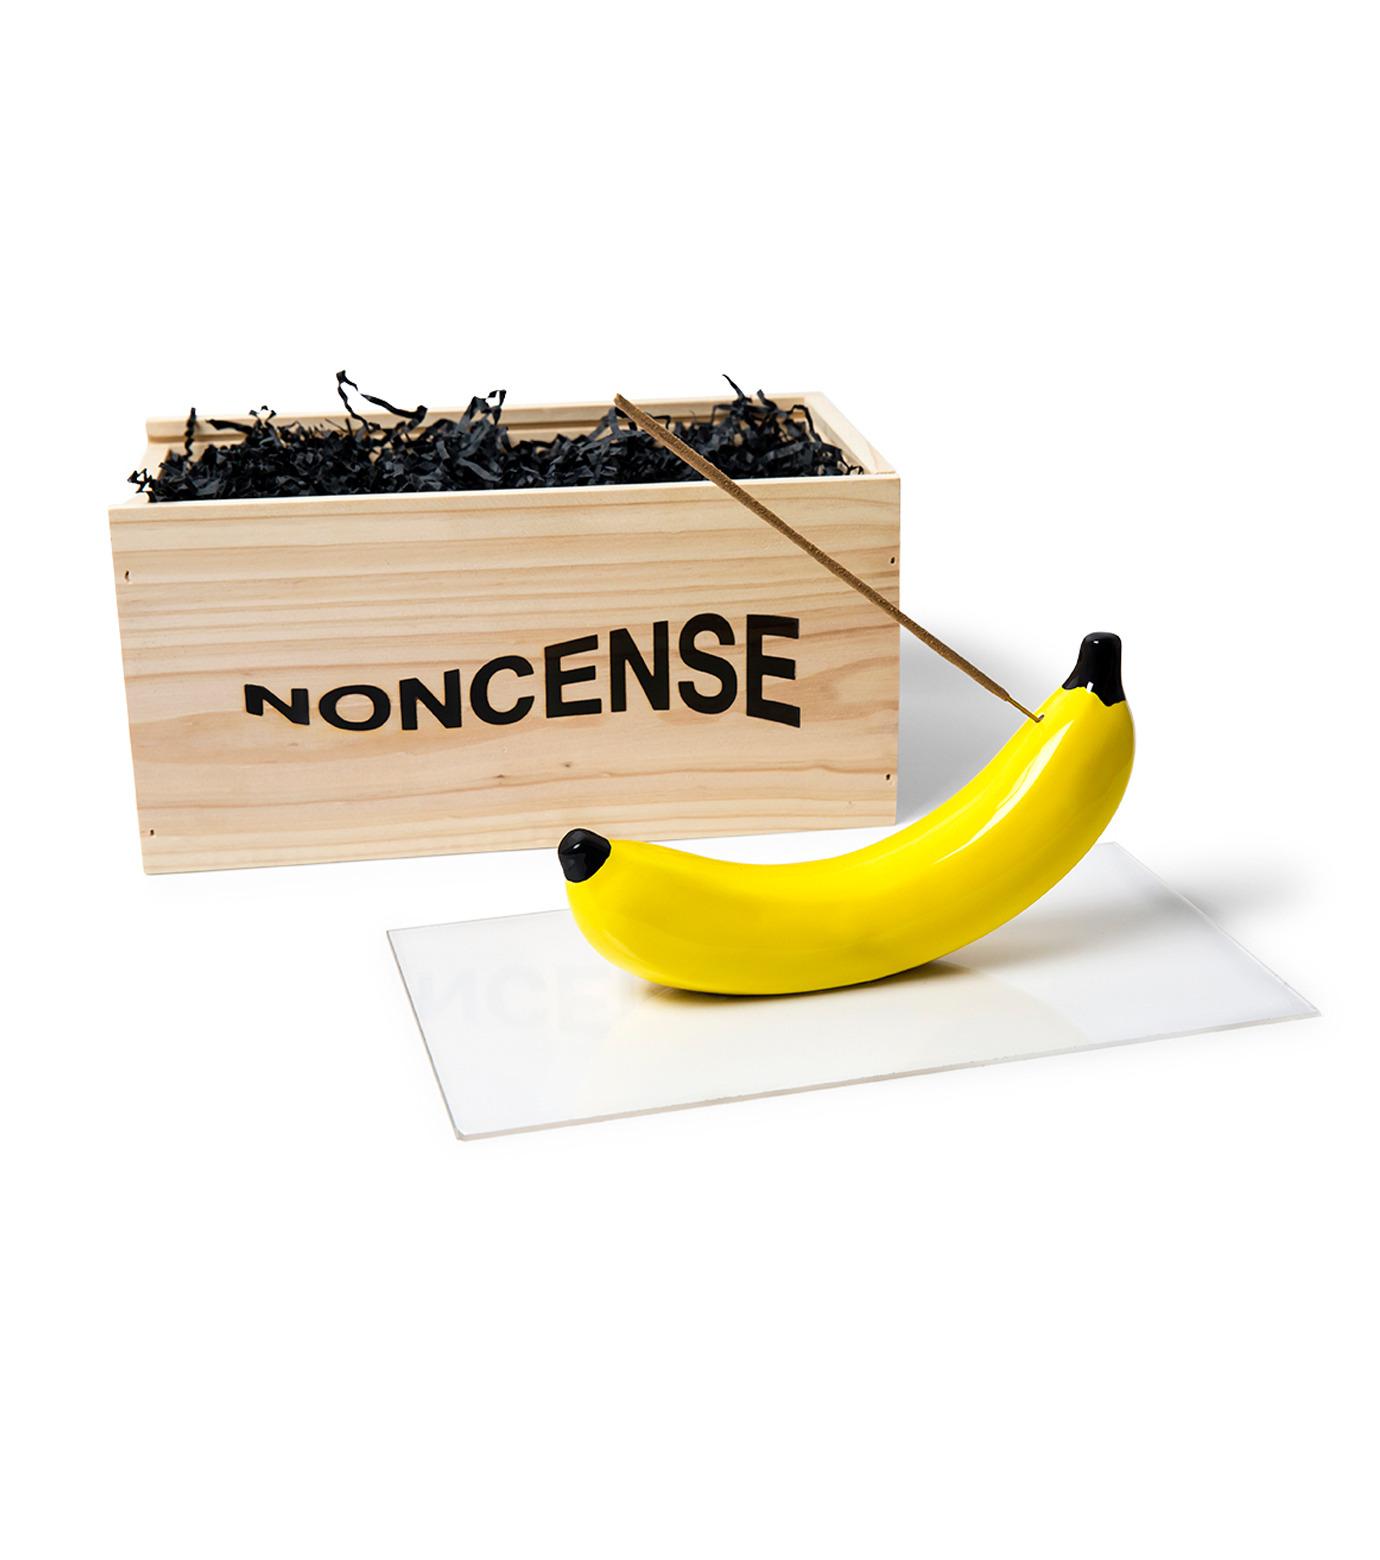 NONCENSE(ノンセンス)のNoncesne Banana ceramic incense burner-YELLOW(インテリア/interior)-N1-32 拡大詳細画像3